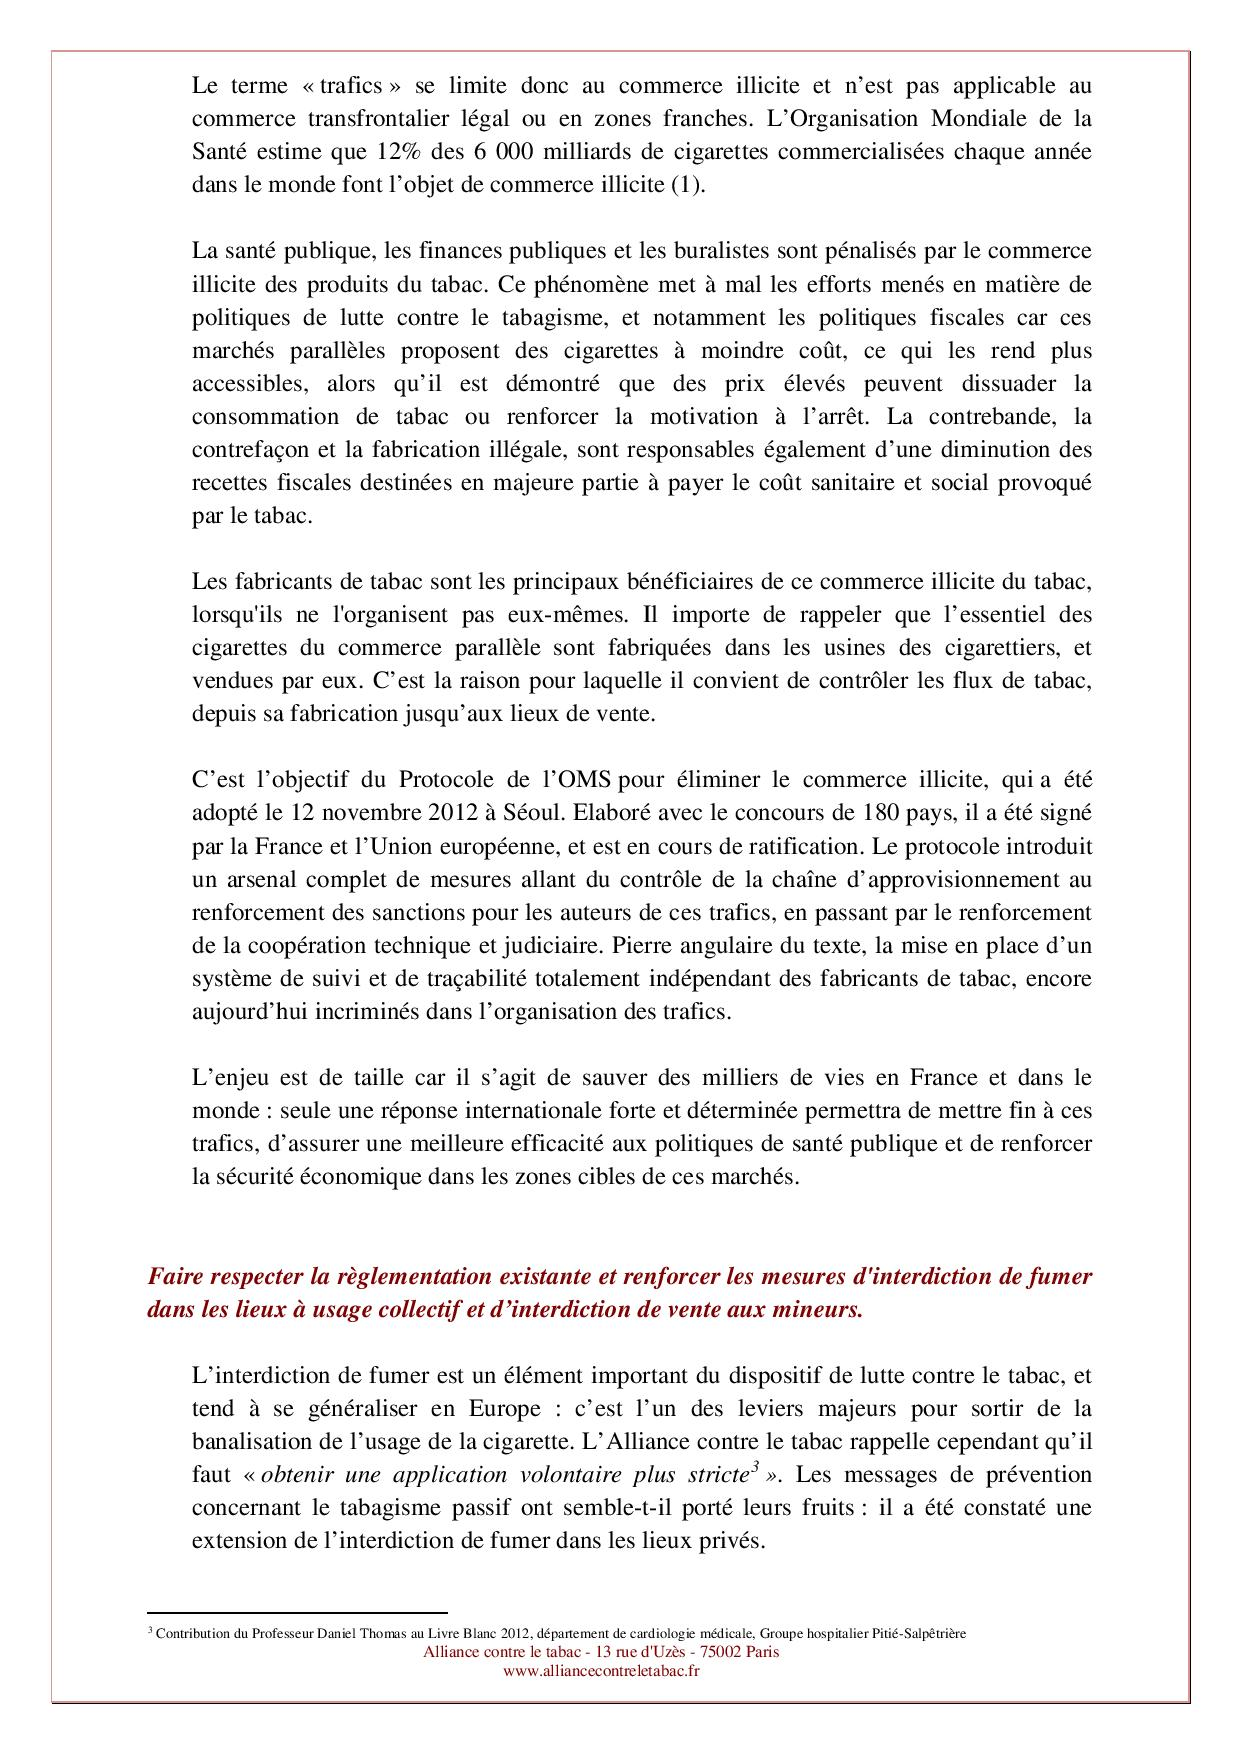 Alliance contre le tabac - DP - 11042017-page-025.jpg